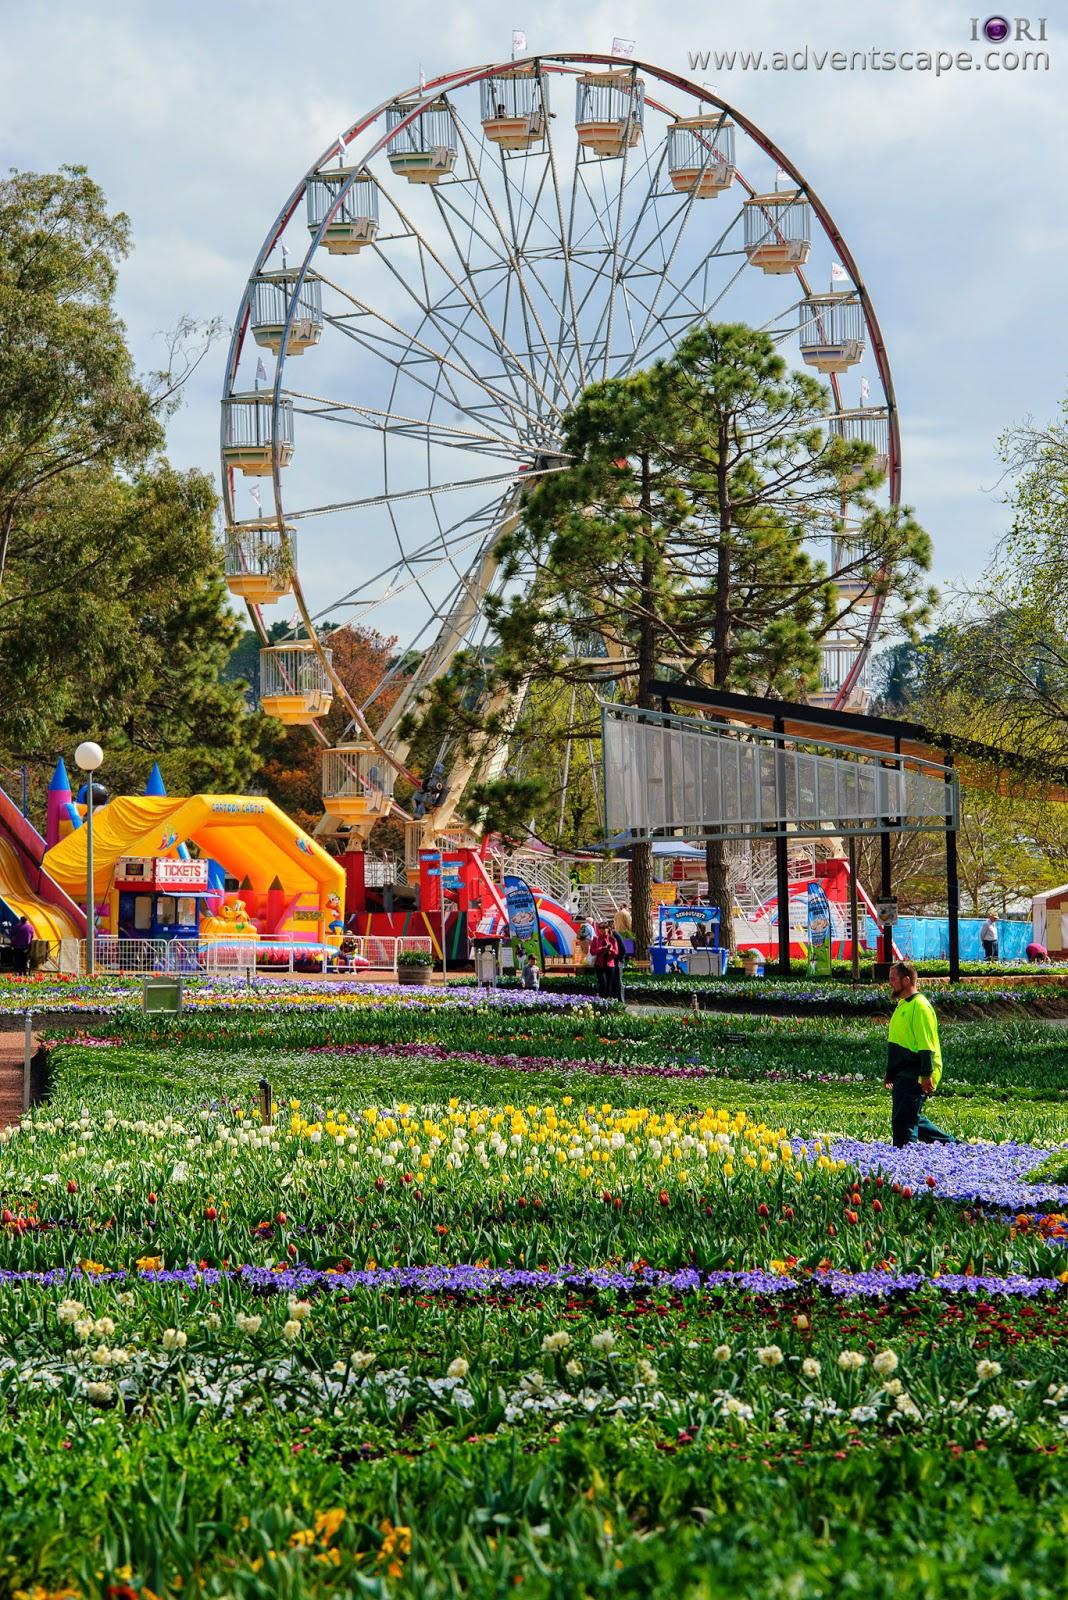 Philip Avellana, iori, advenscape, Floriade, 2014, spring festival, Canberra, ACT, Australian Capital Territory, park, flowers, blossom, Ferris Wheel